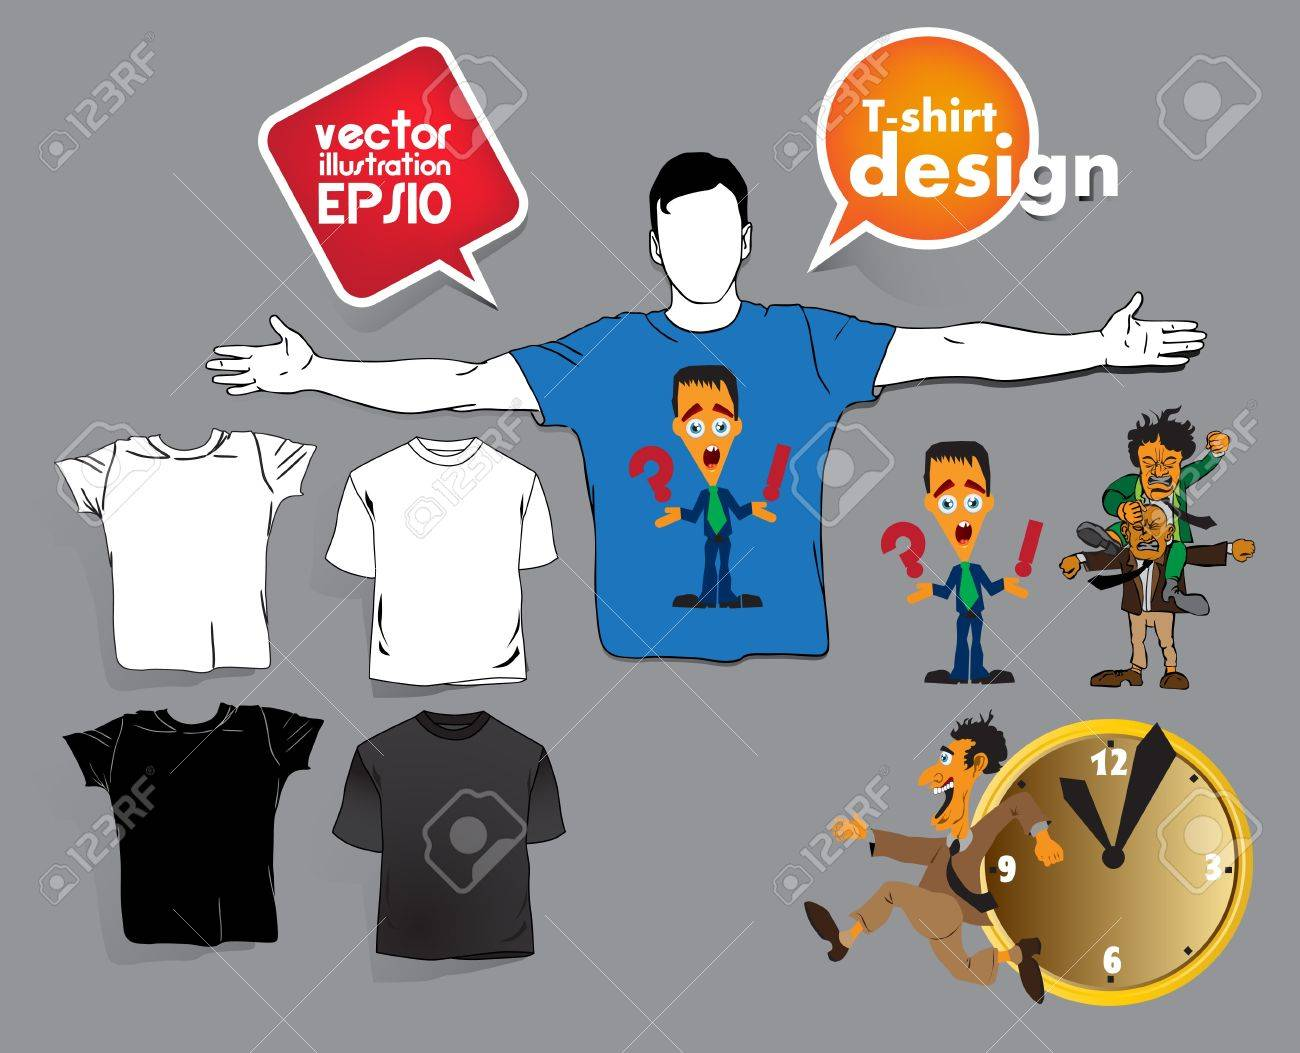 T-shirt design. Stock Vector - 17413427